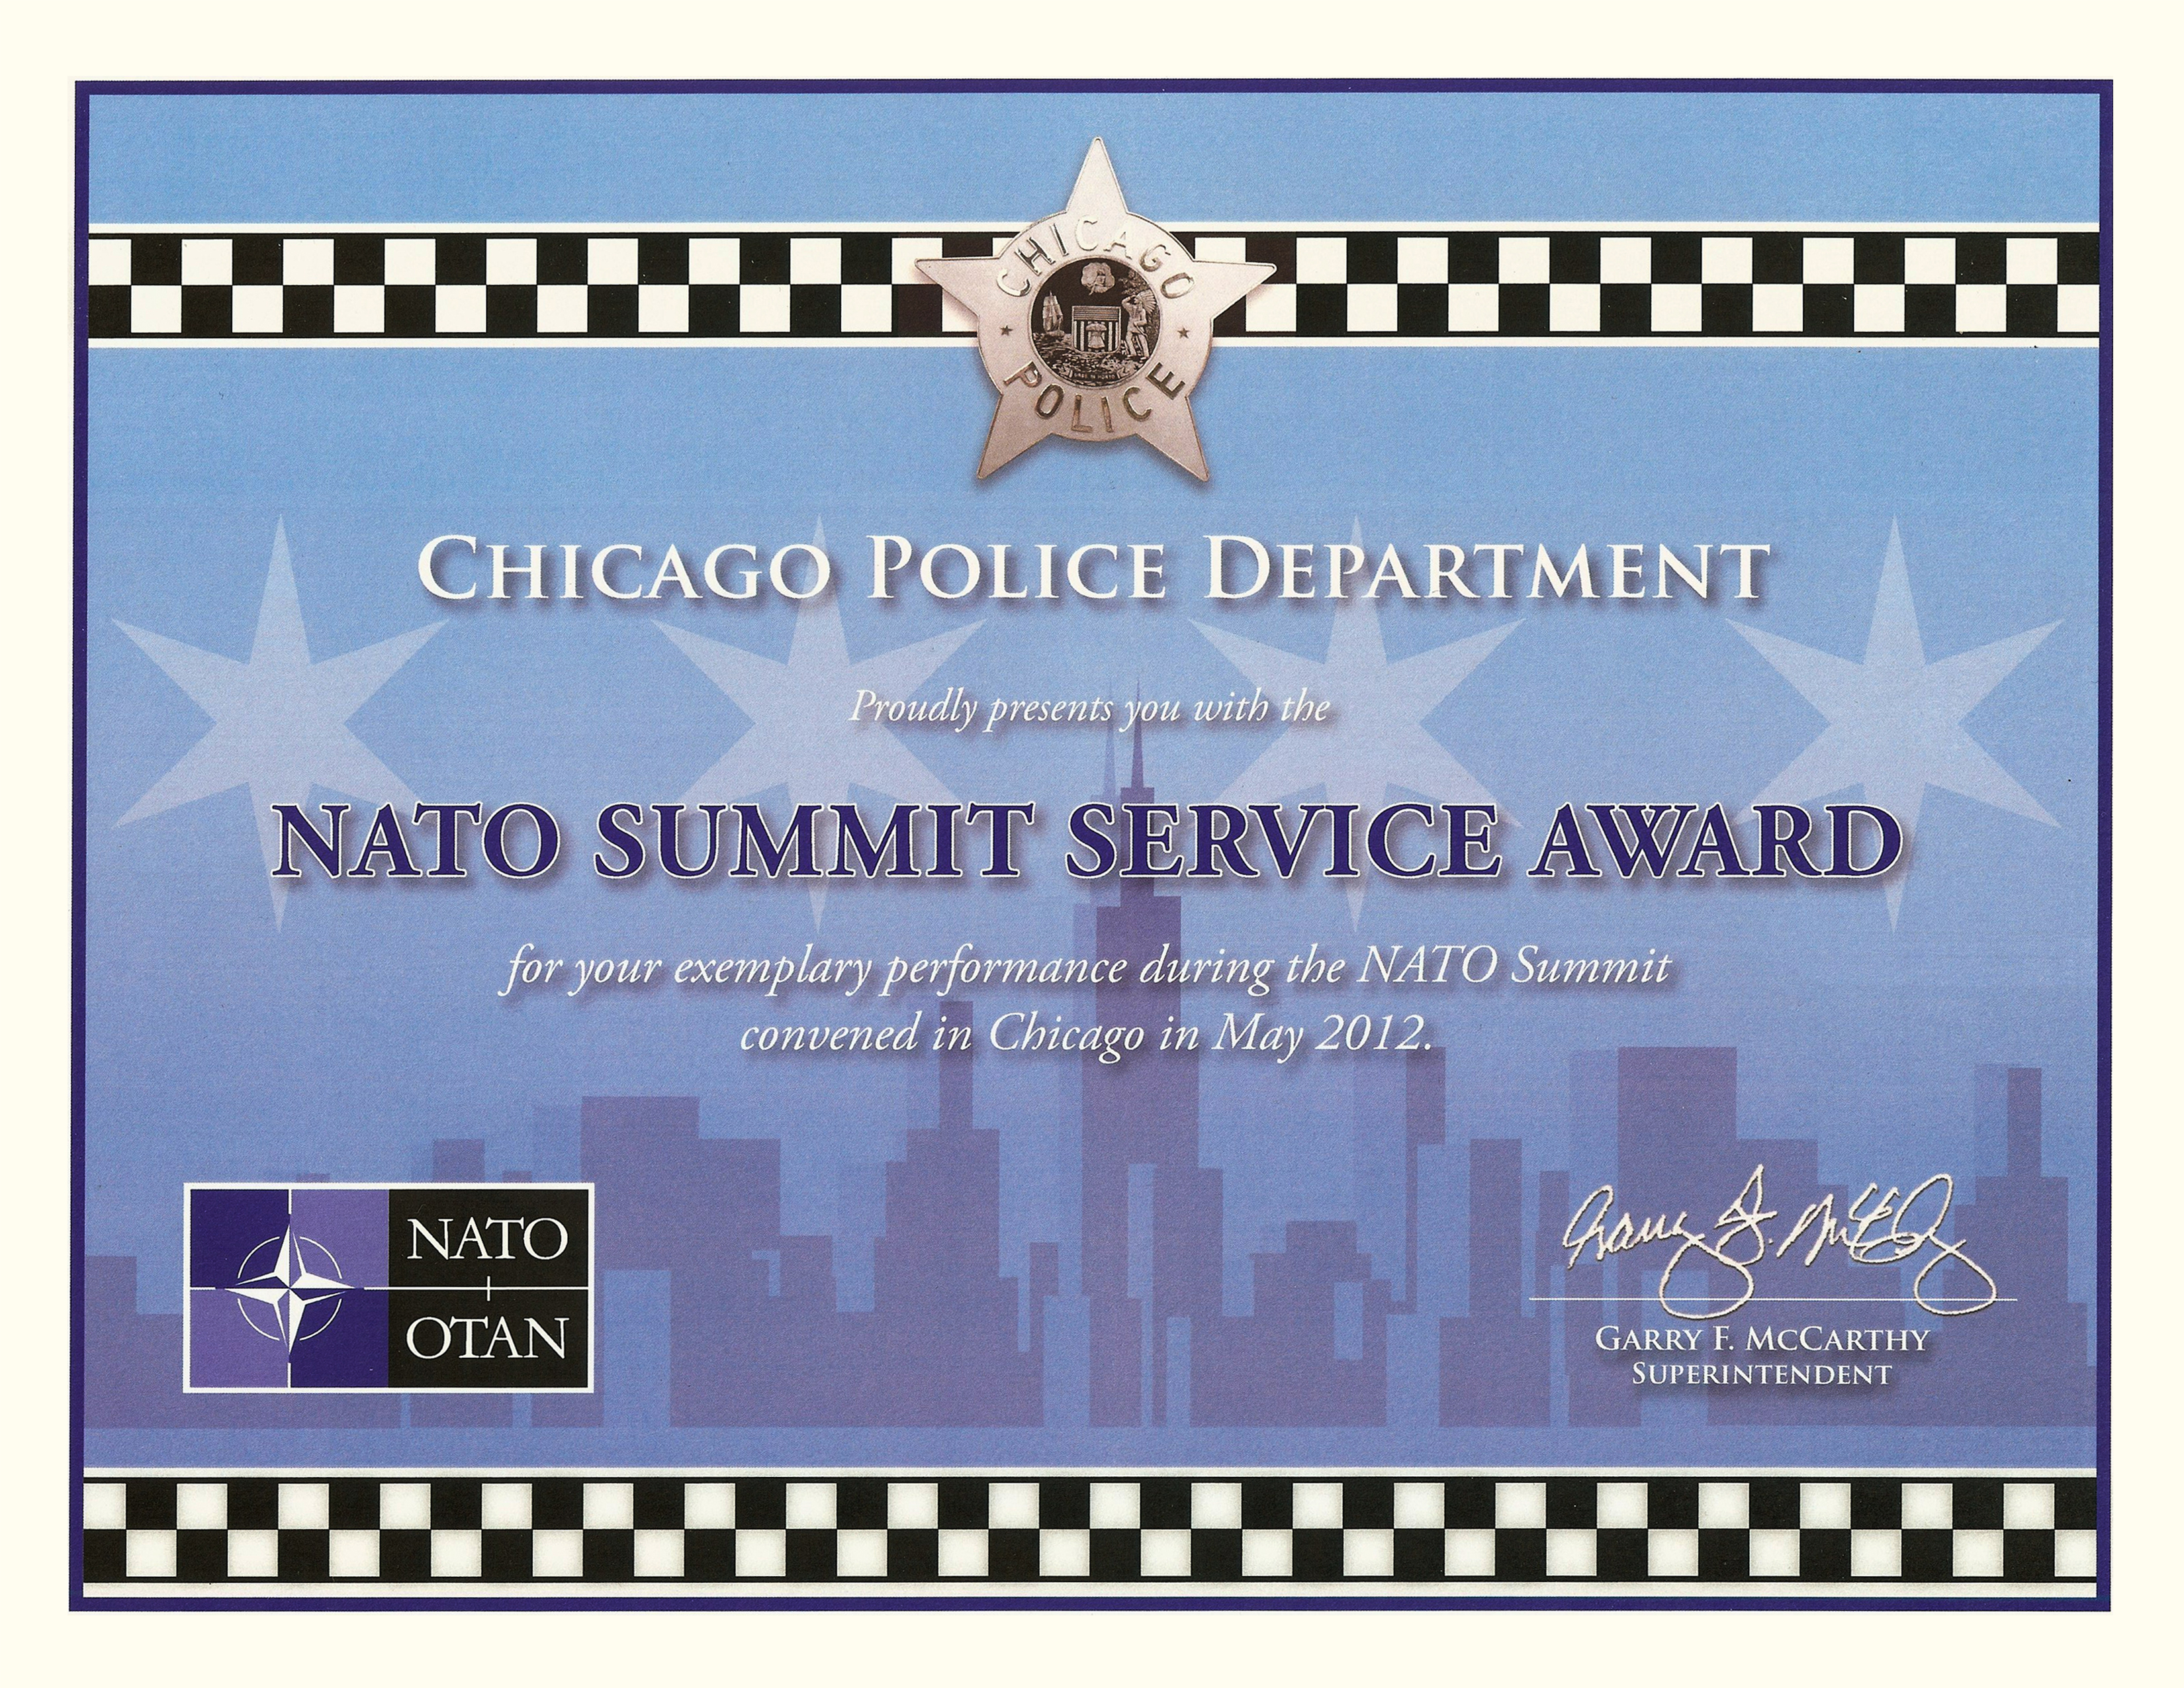 Nato Summit Service Award Certificate